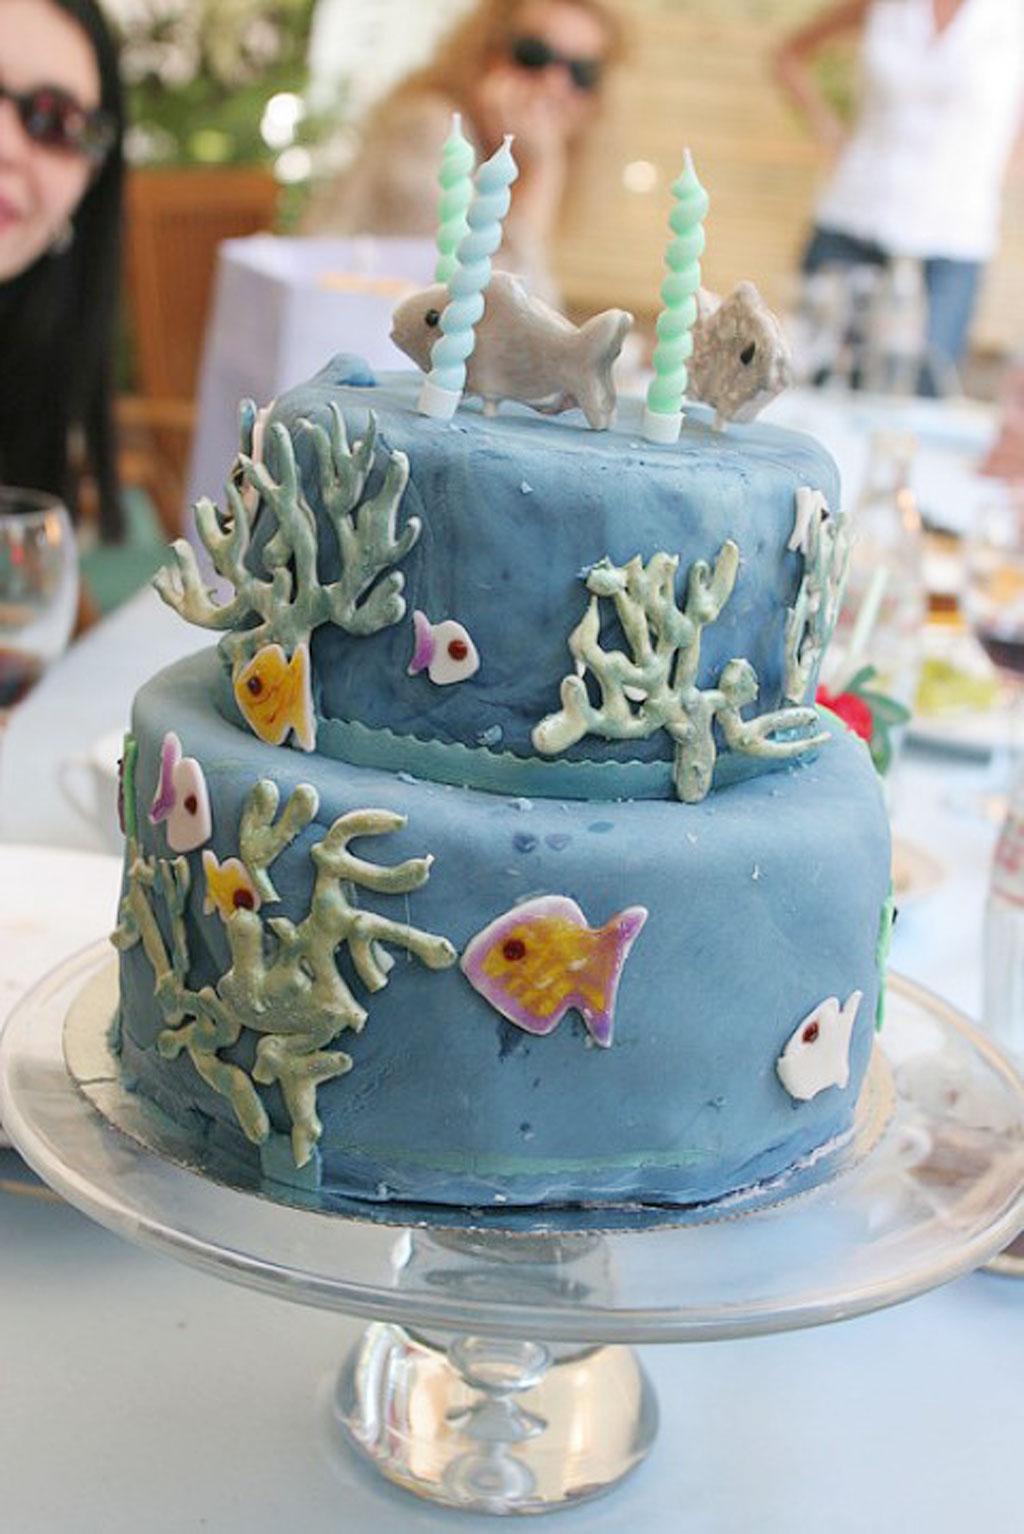 Fishing themed birthday cakes birthday cake cake ideas for Fishing themed birthday cakes